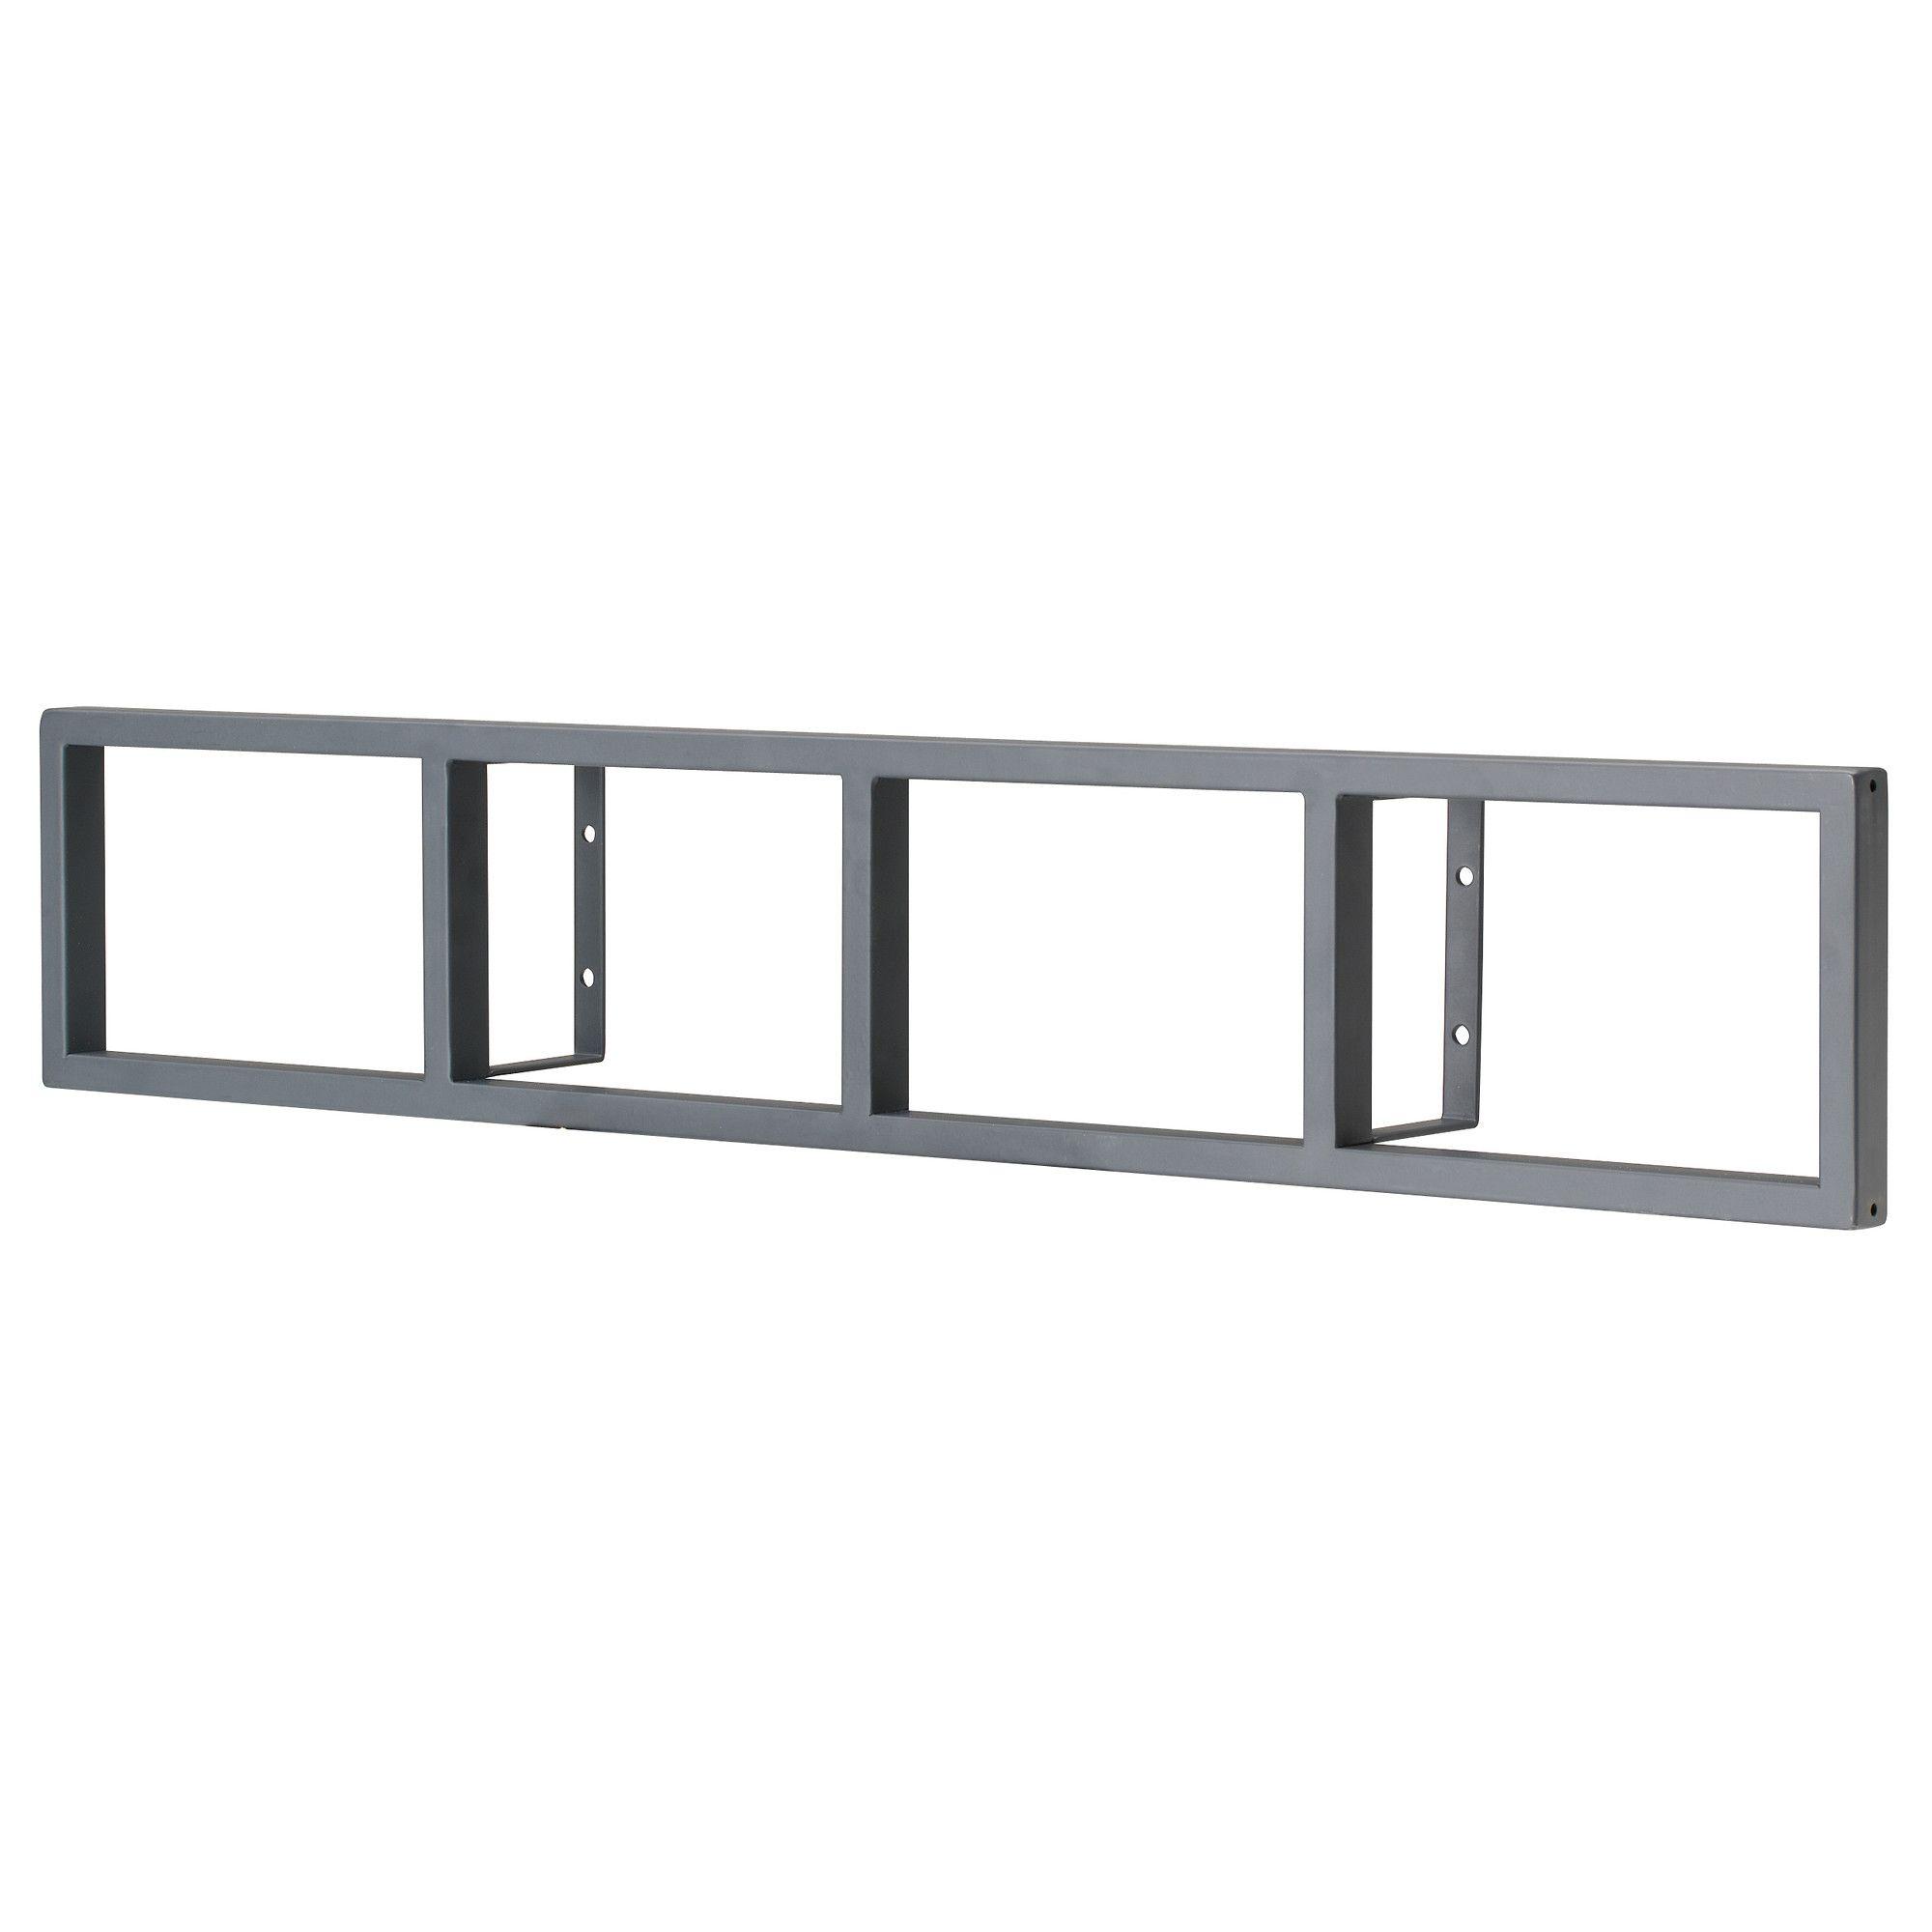 ikea wandregal metall wei. Black Bedroom Furniture Sets. Home Design Ideas